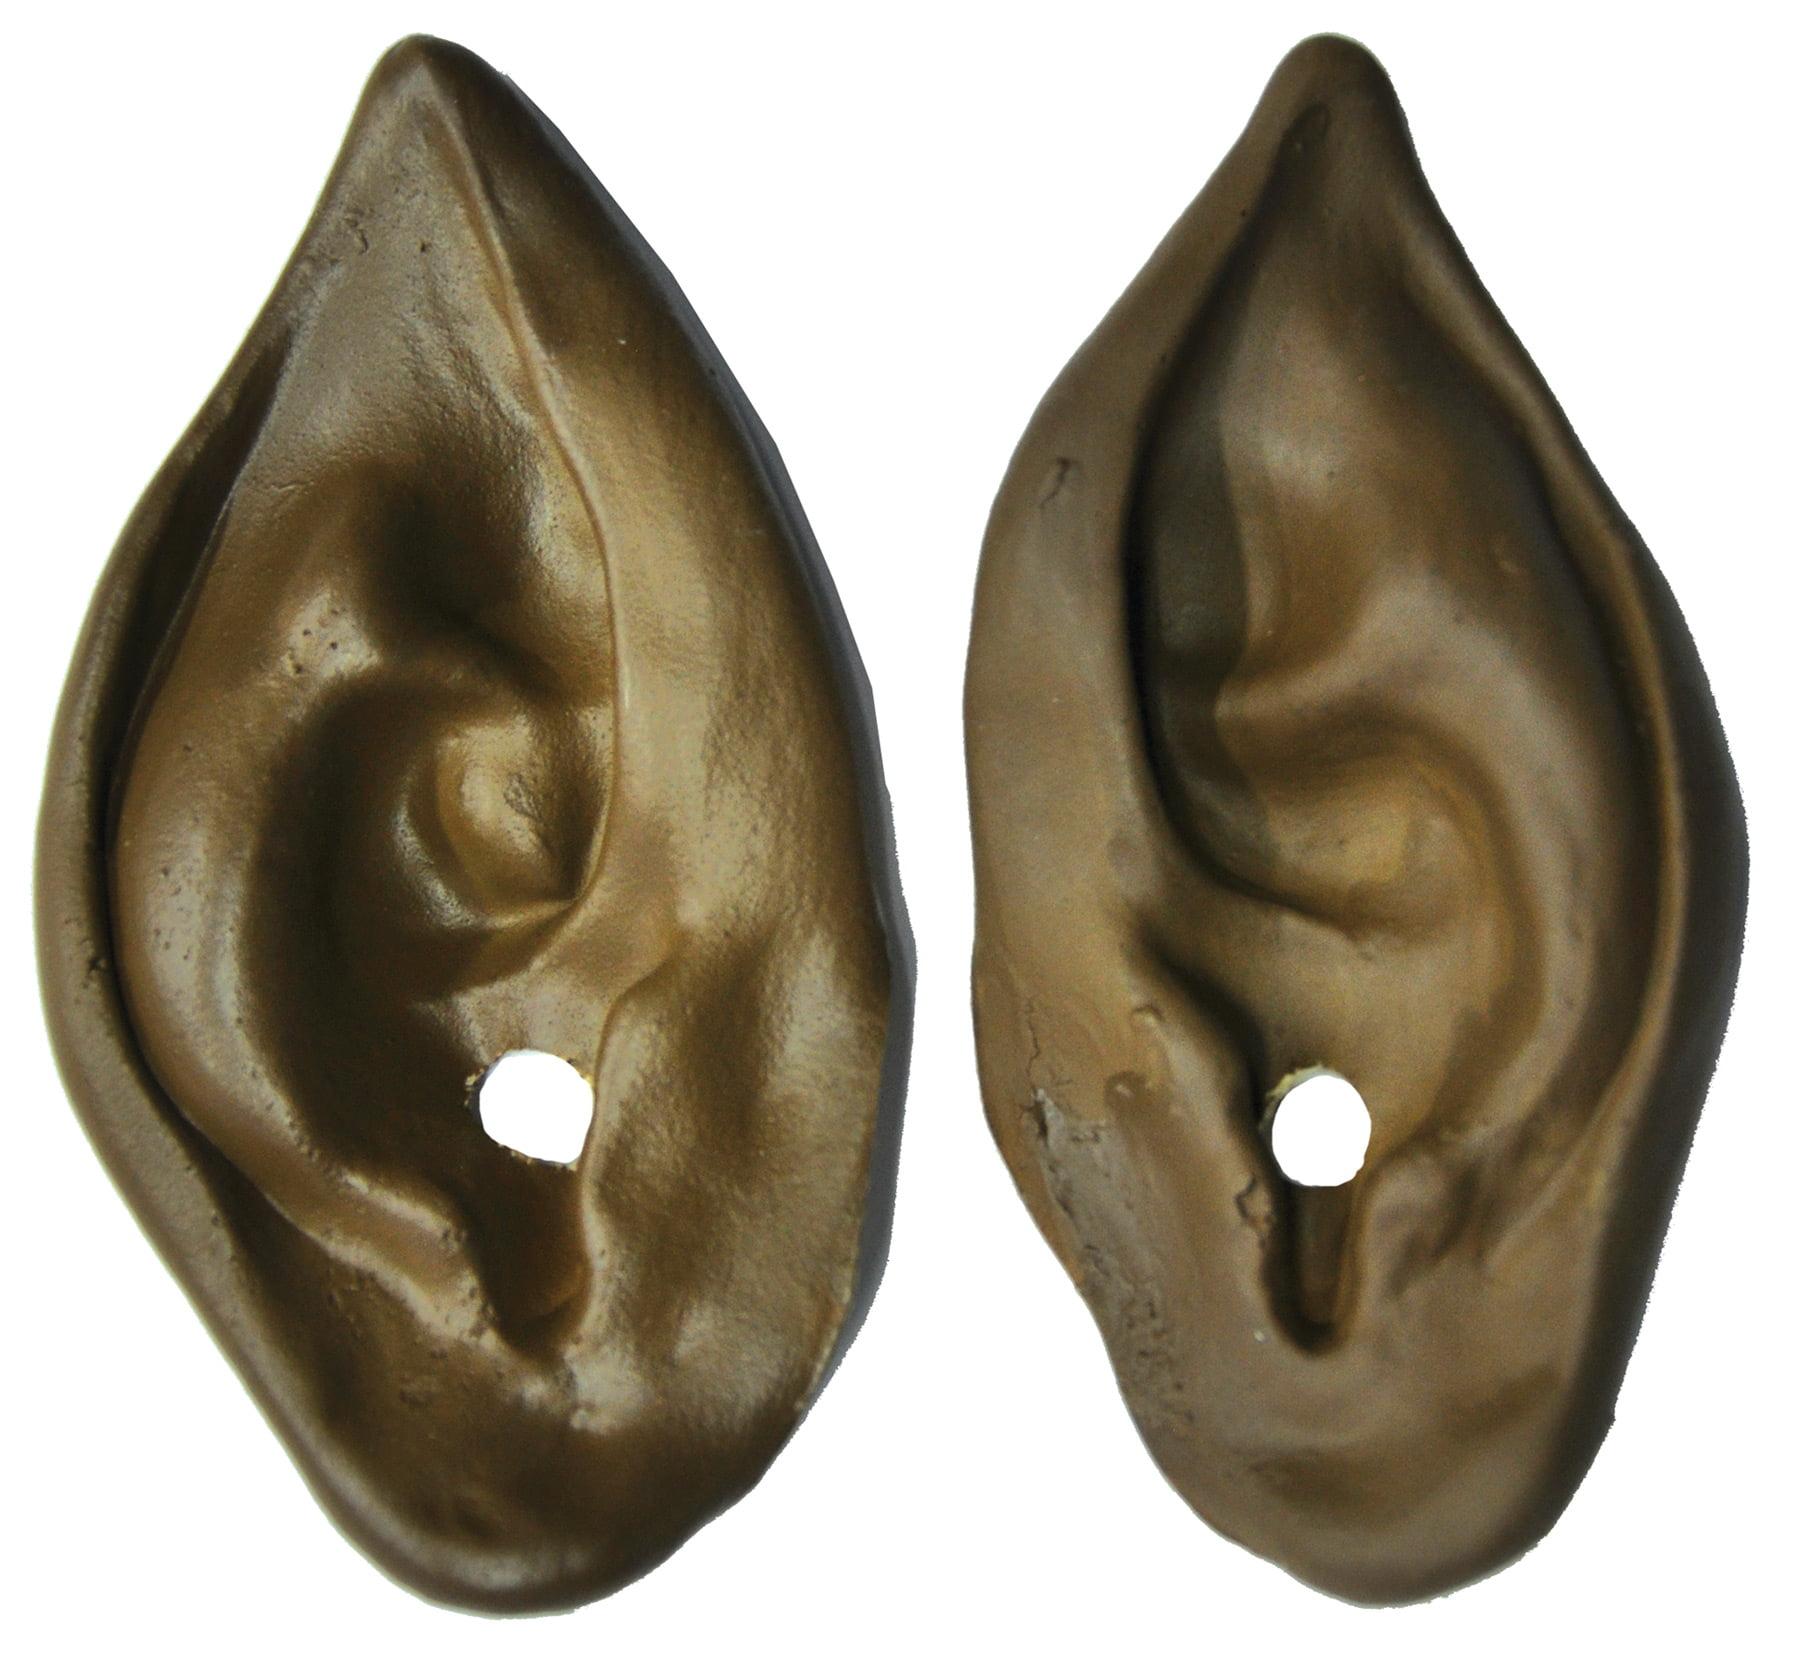 Brown Werewolf Ears Halloween Accessory